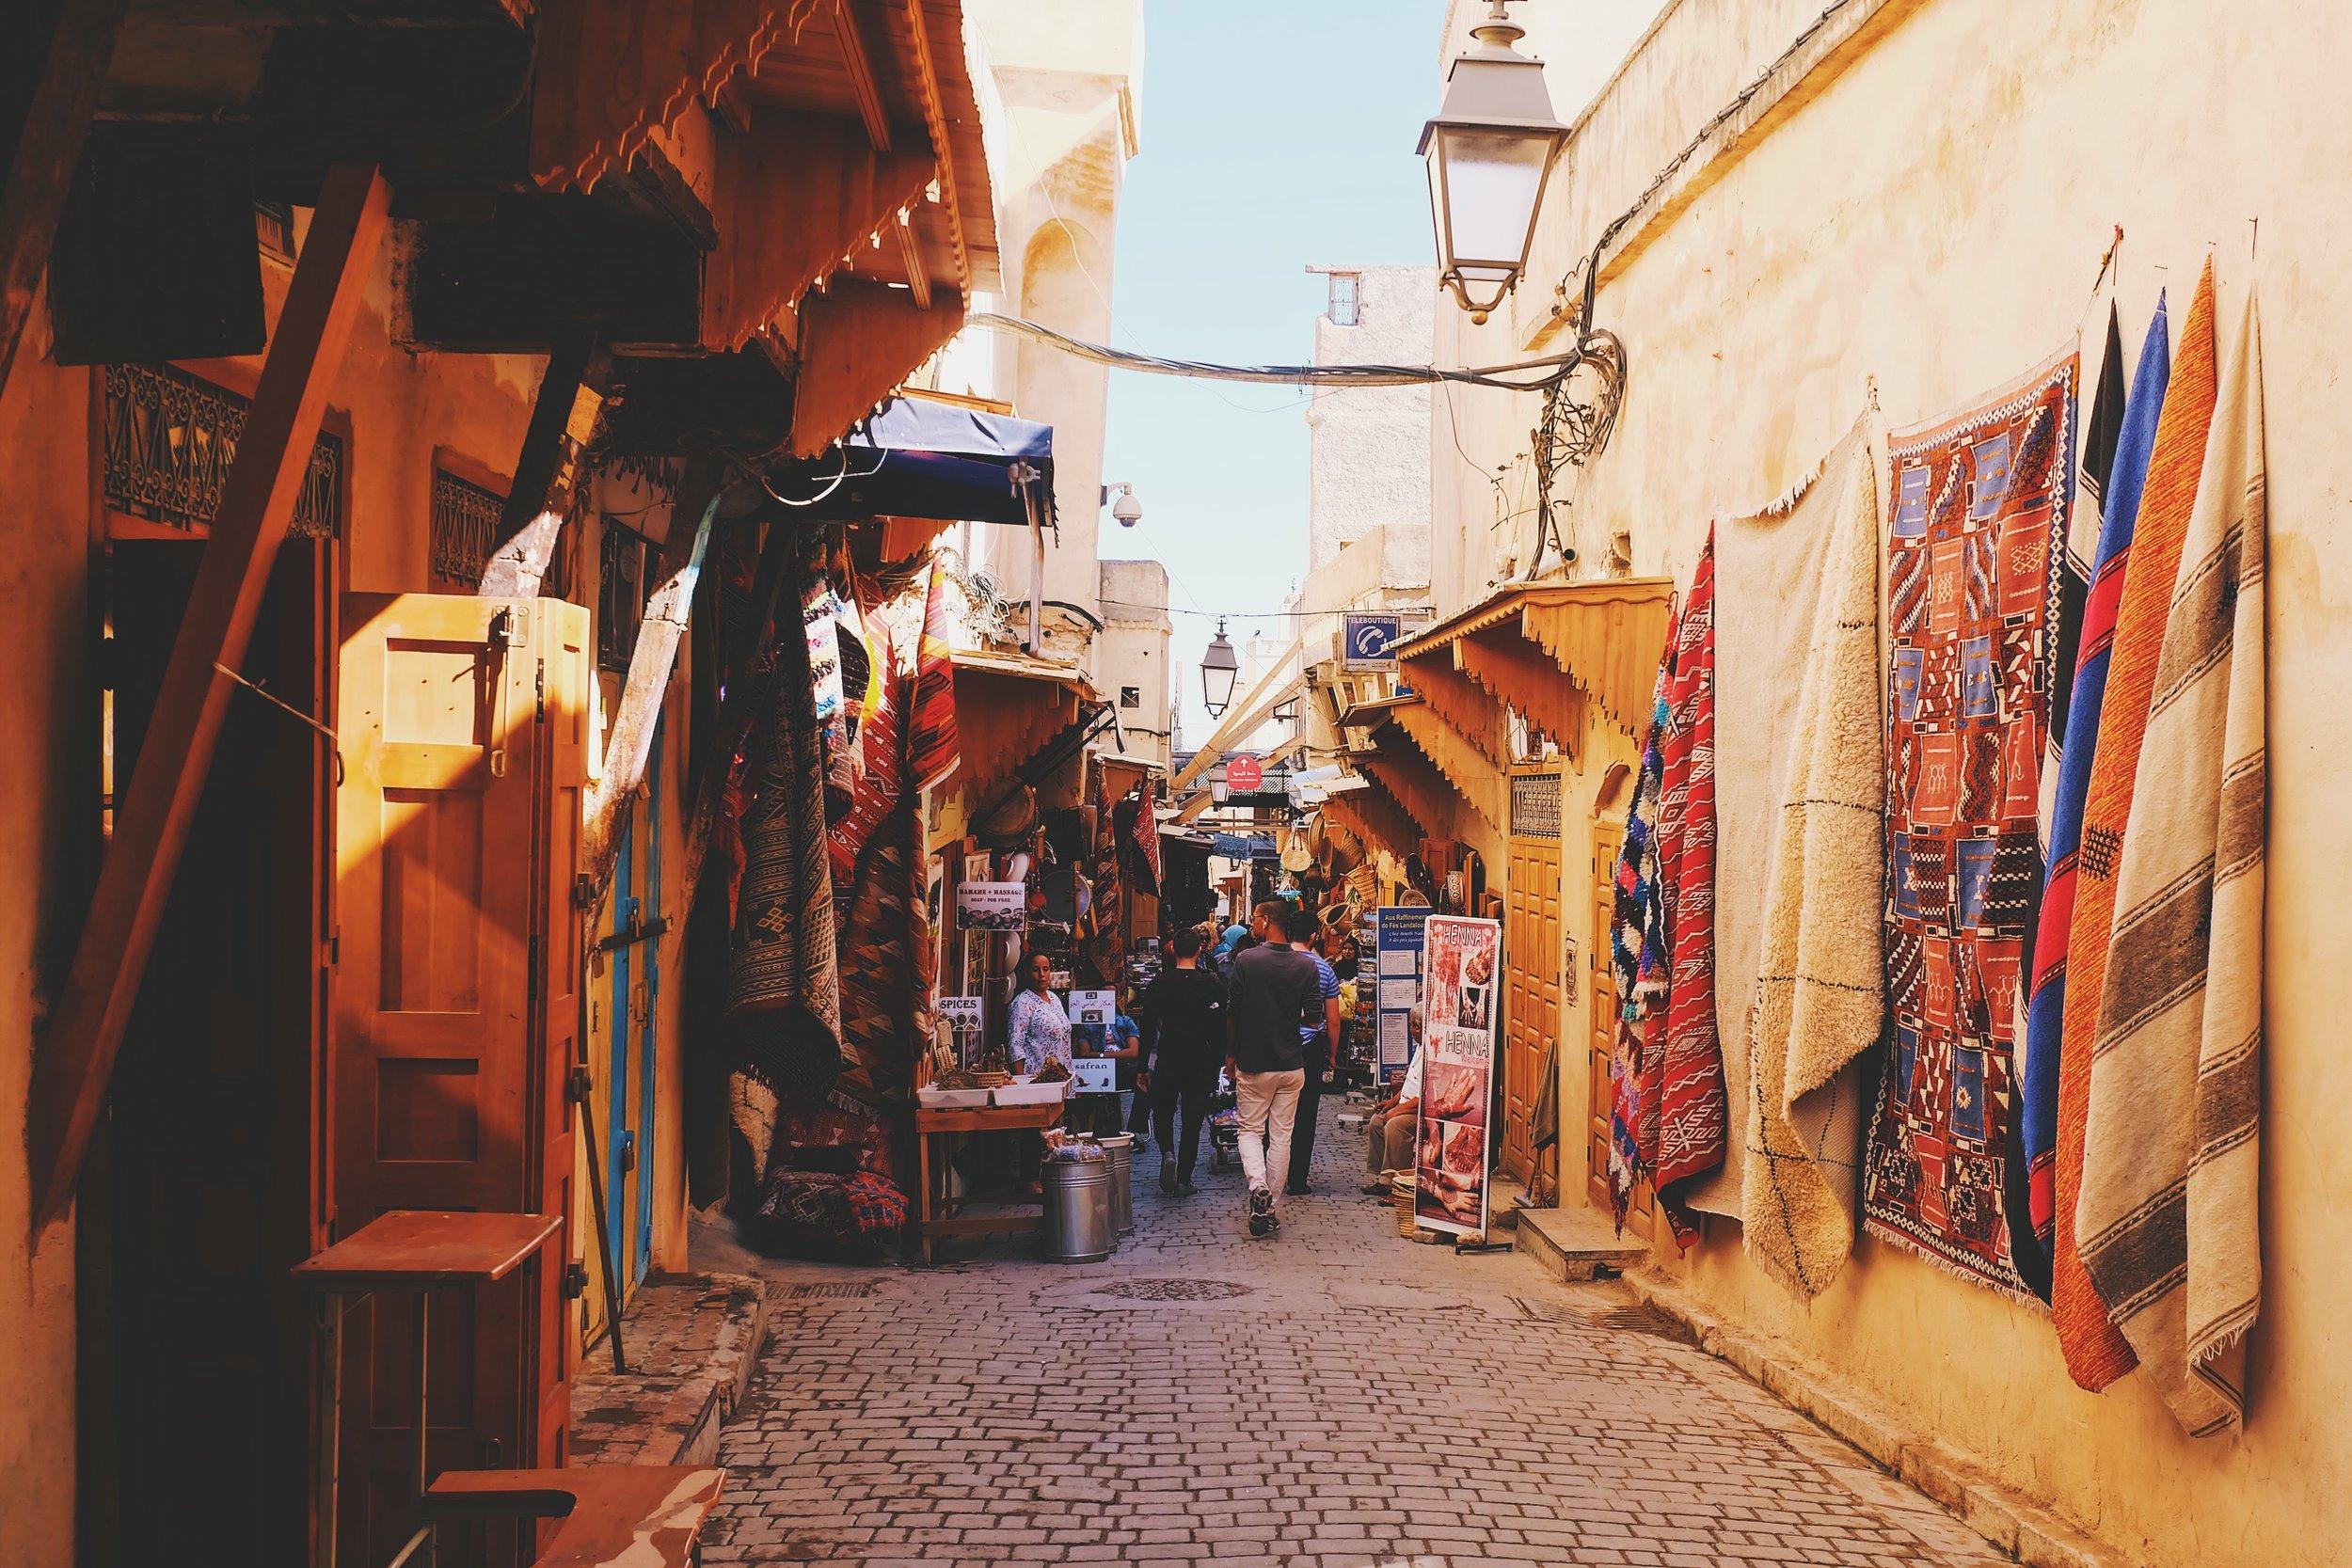 Markets in the old medina